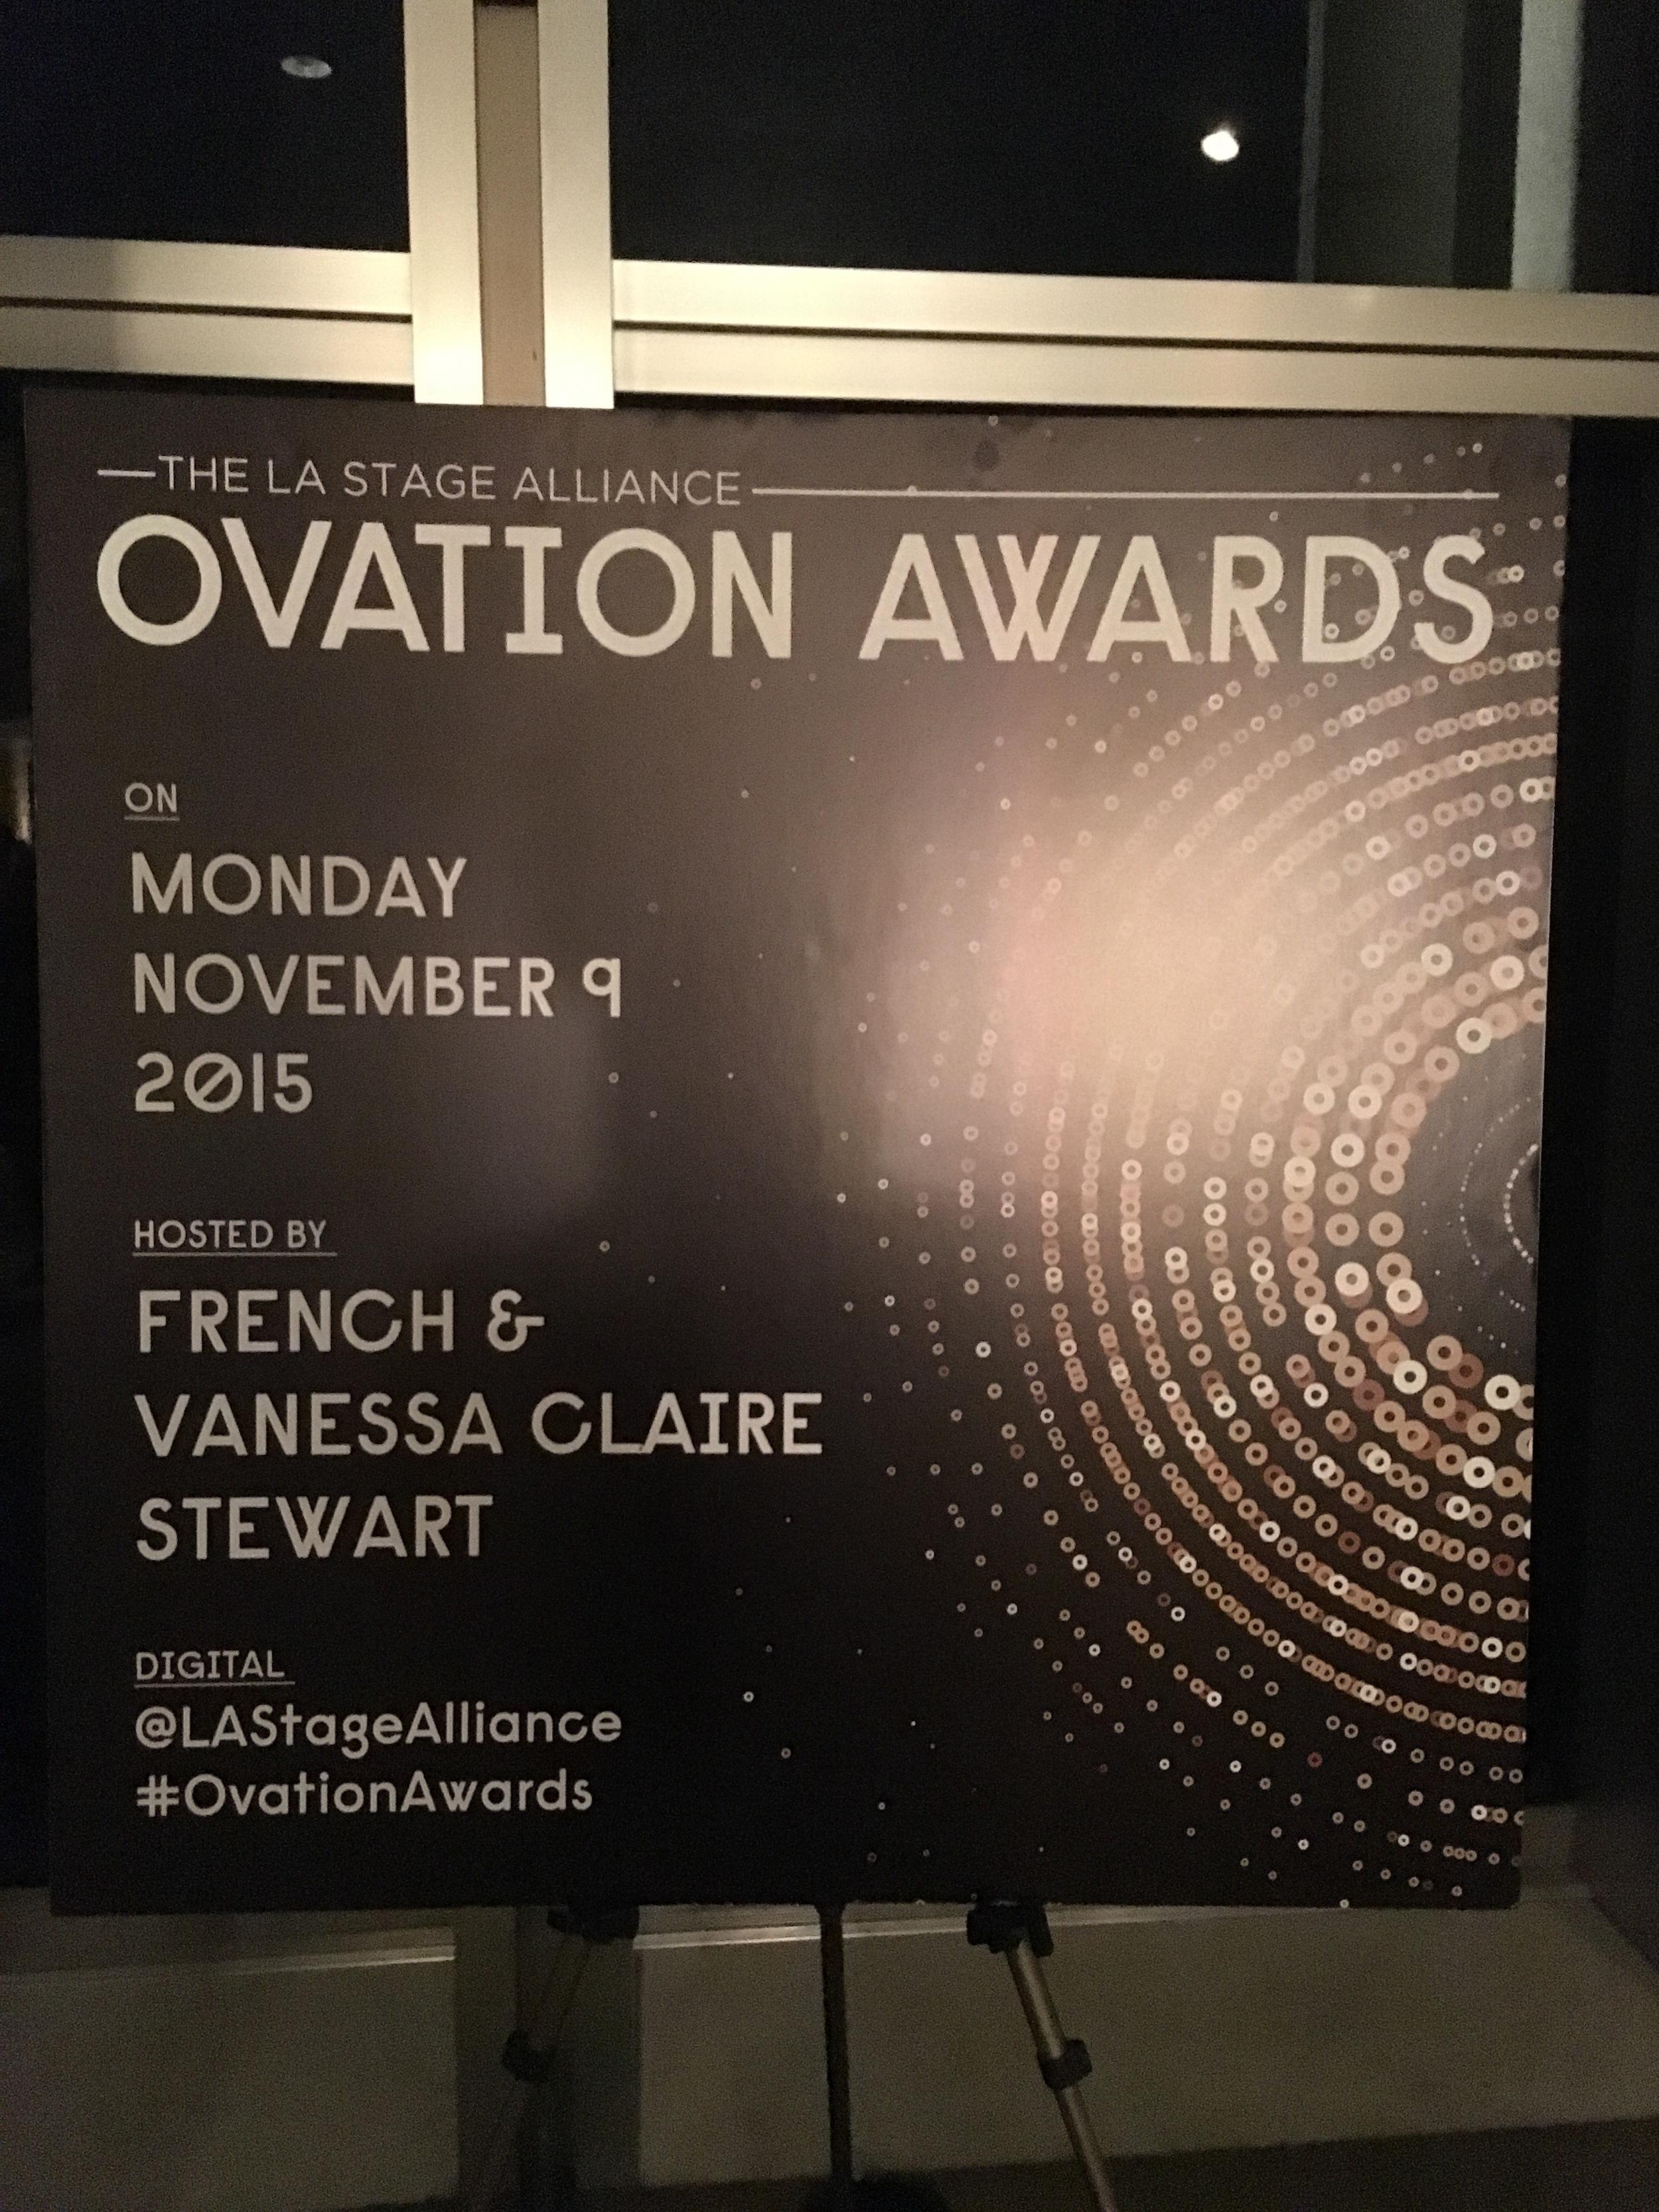 Ovation Awards poster.JPG